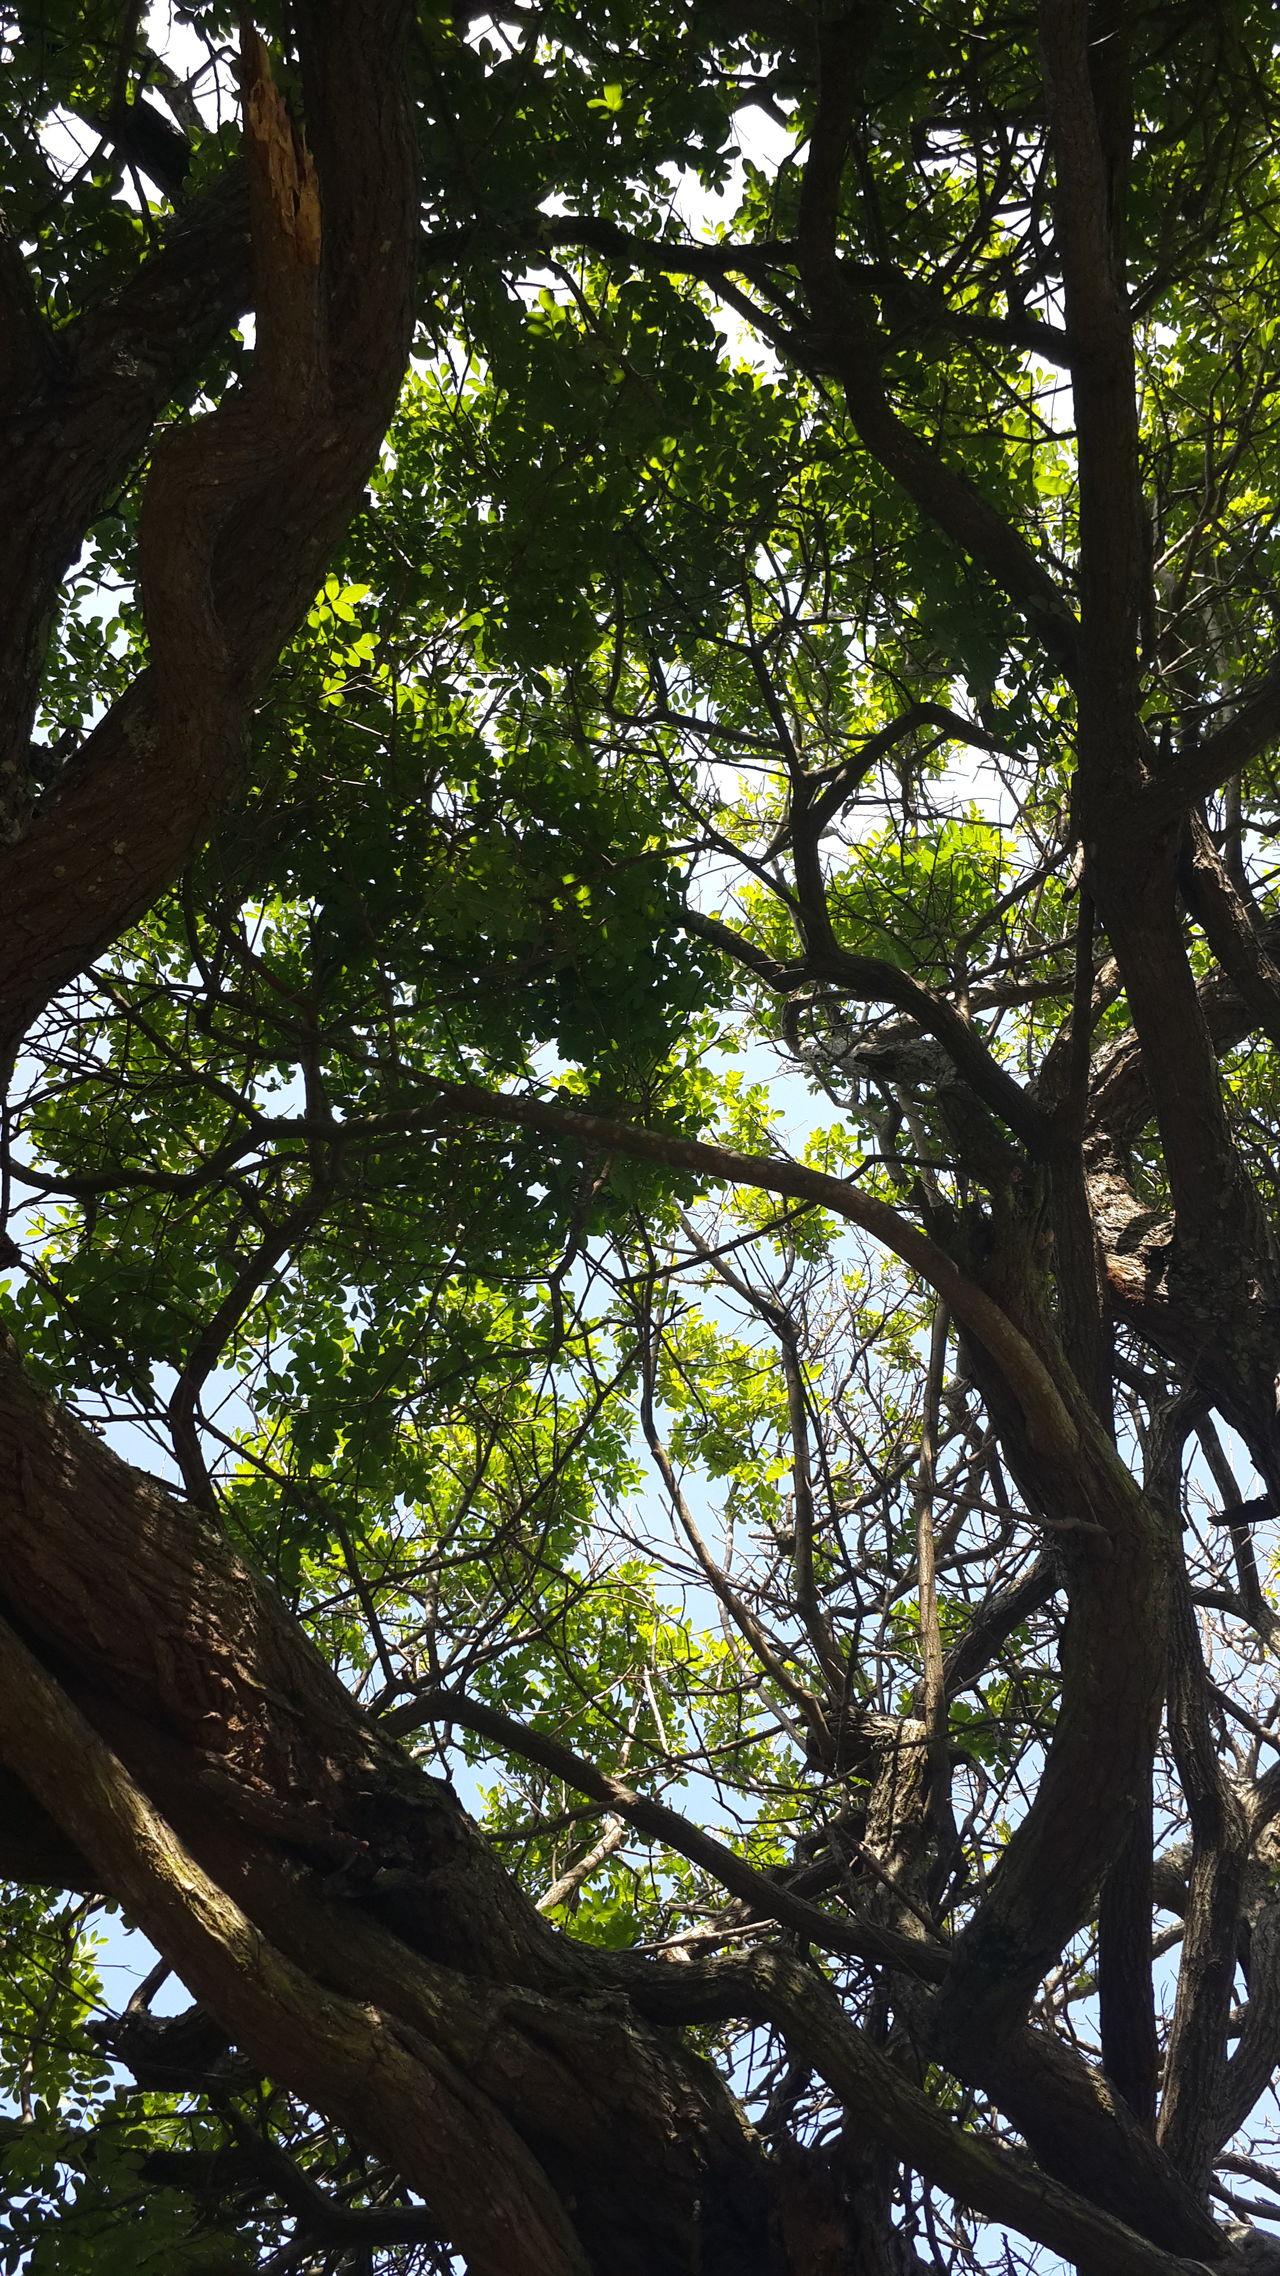 brett scott eyeem south africa relaxing hanging